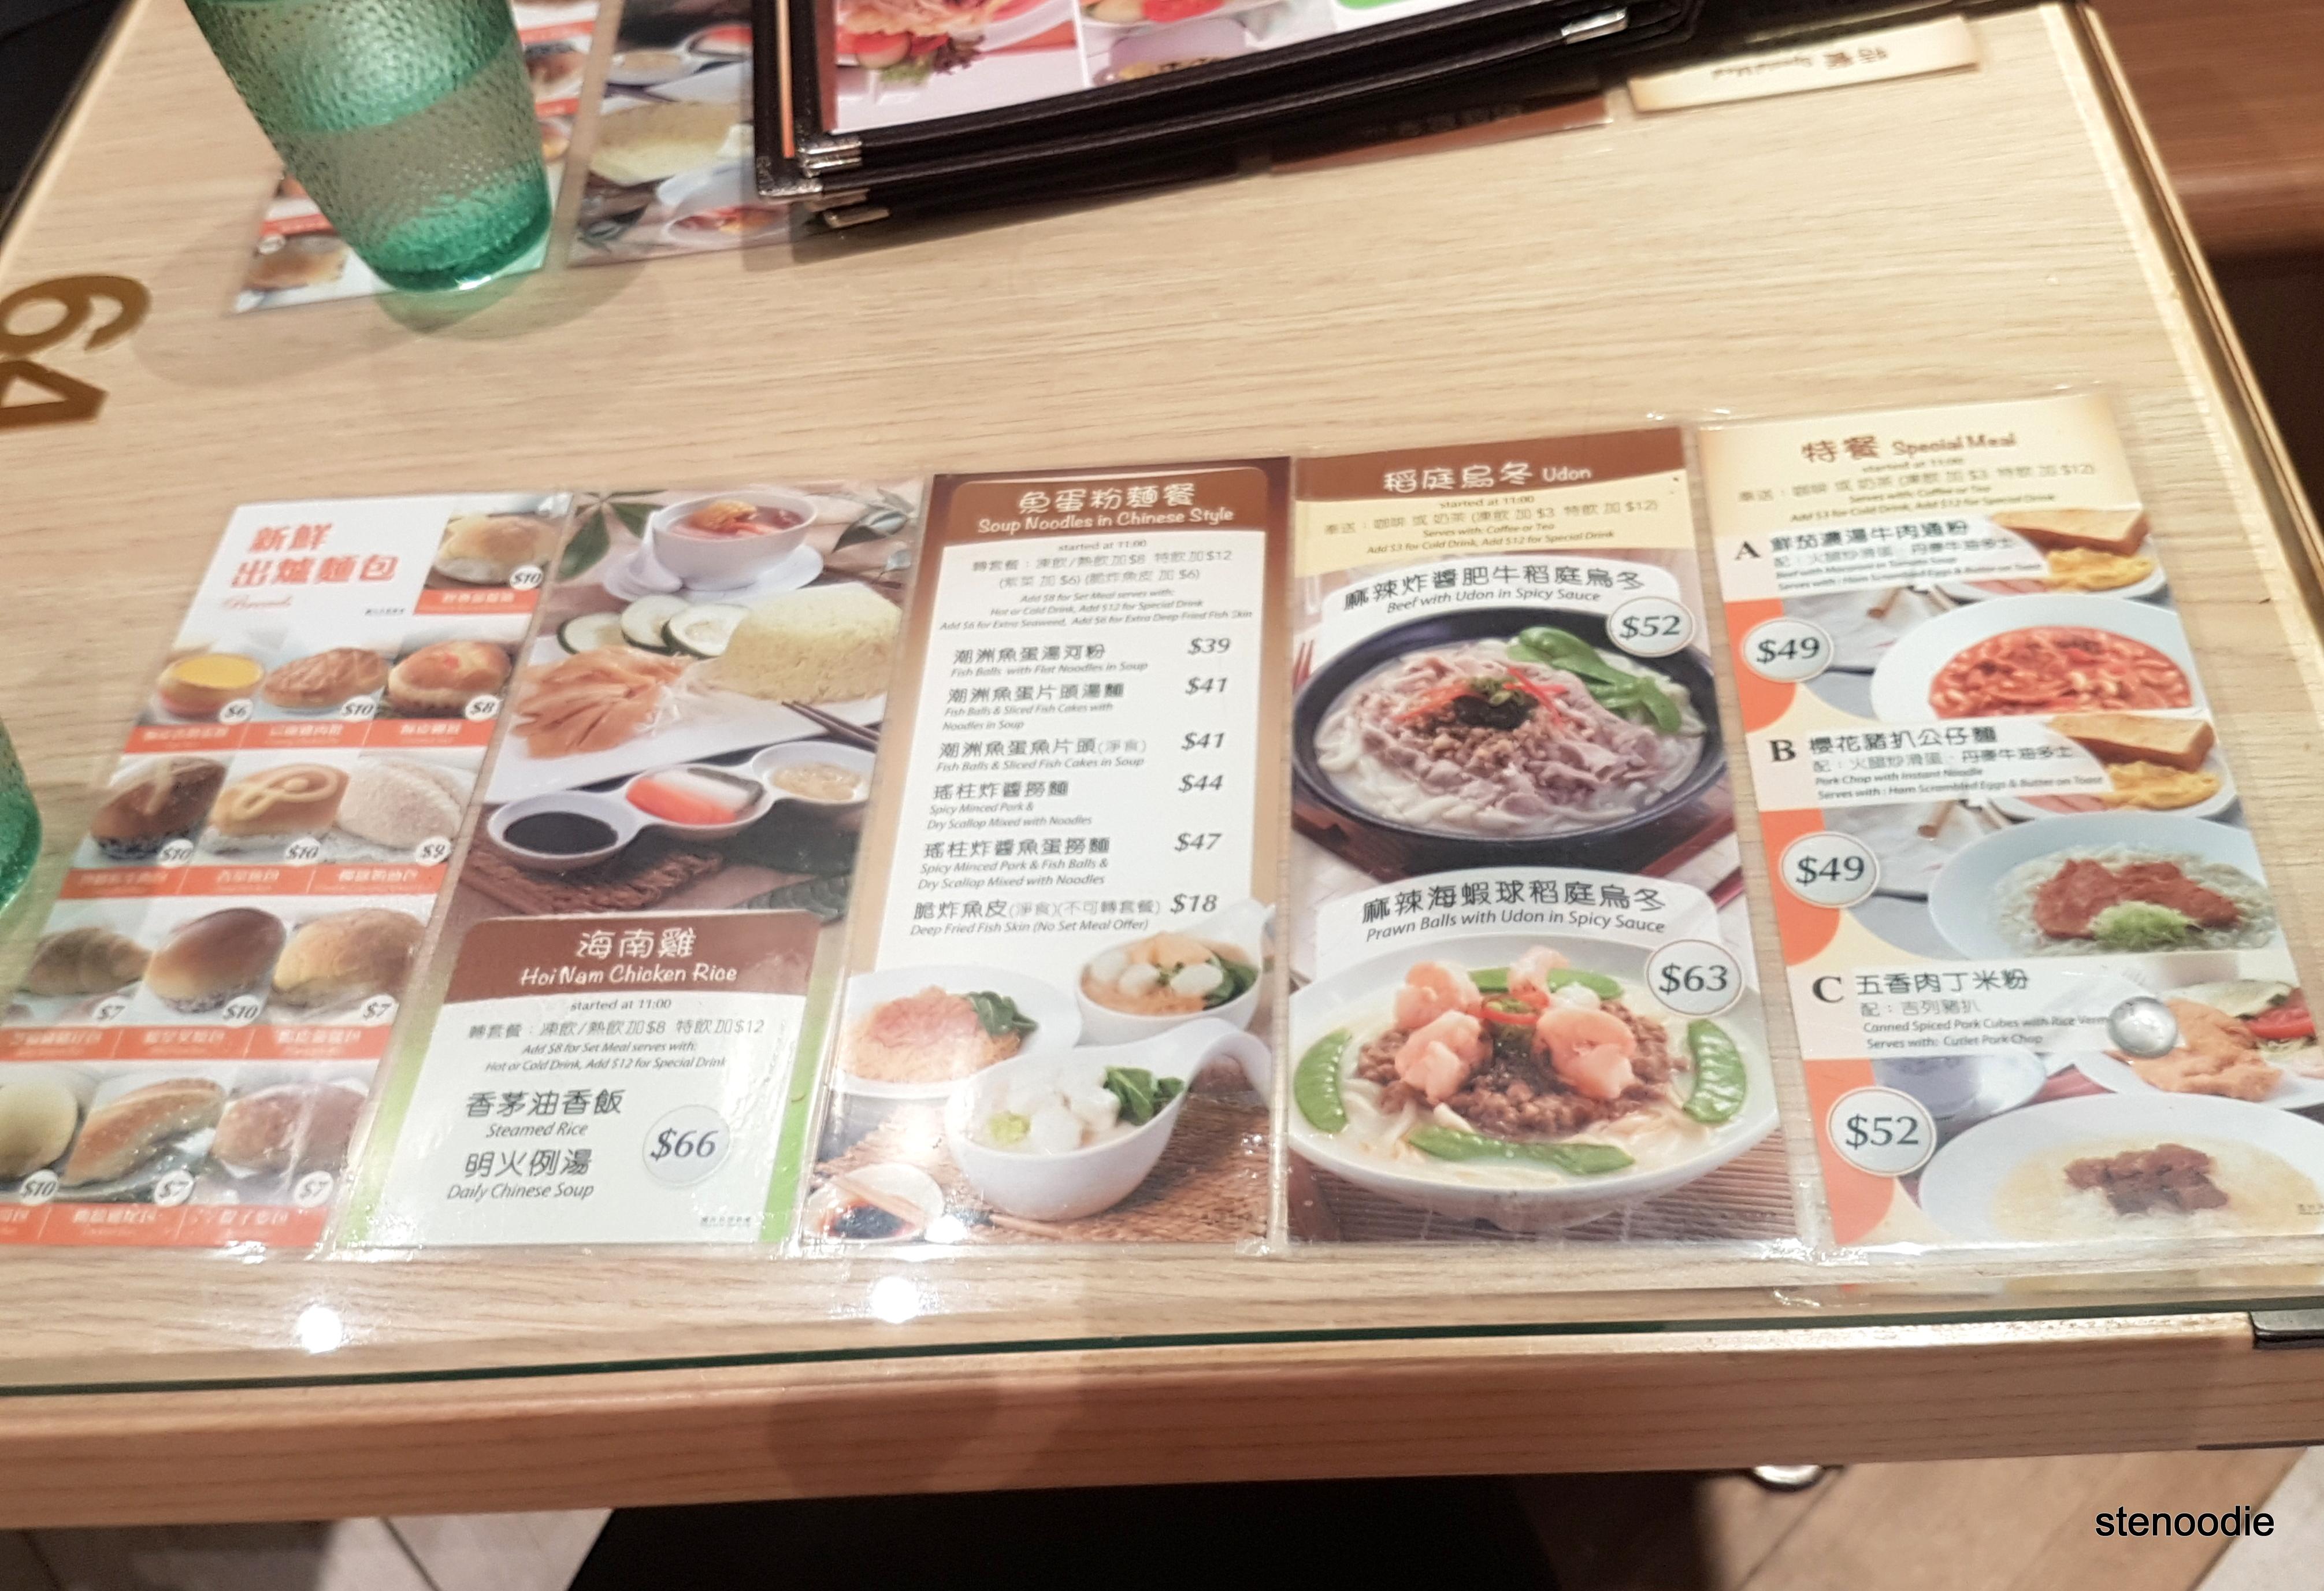 Crown Café Hong Kong menu and prices